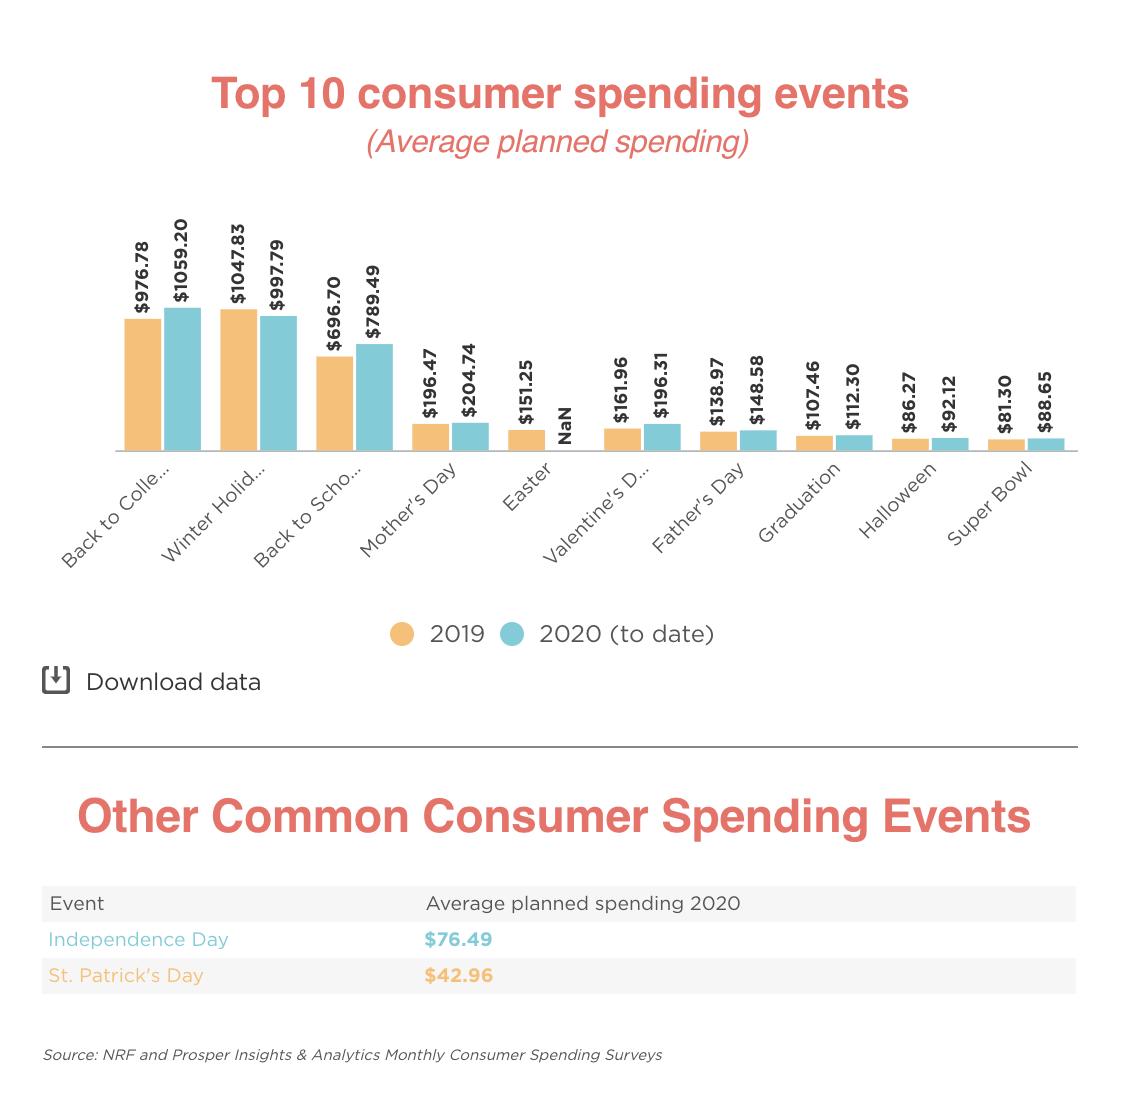 Top Consumer Spending Events bar chart